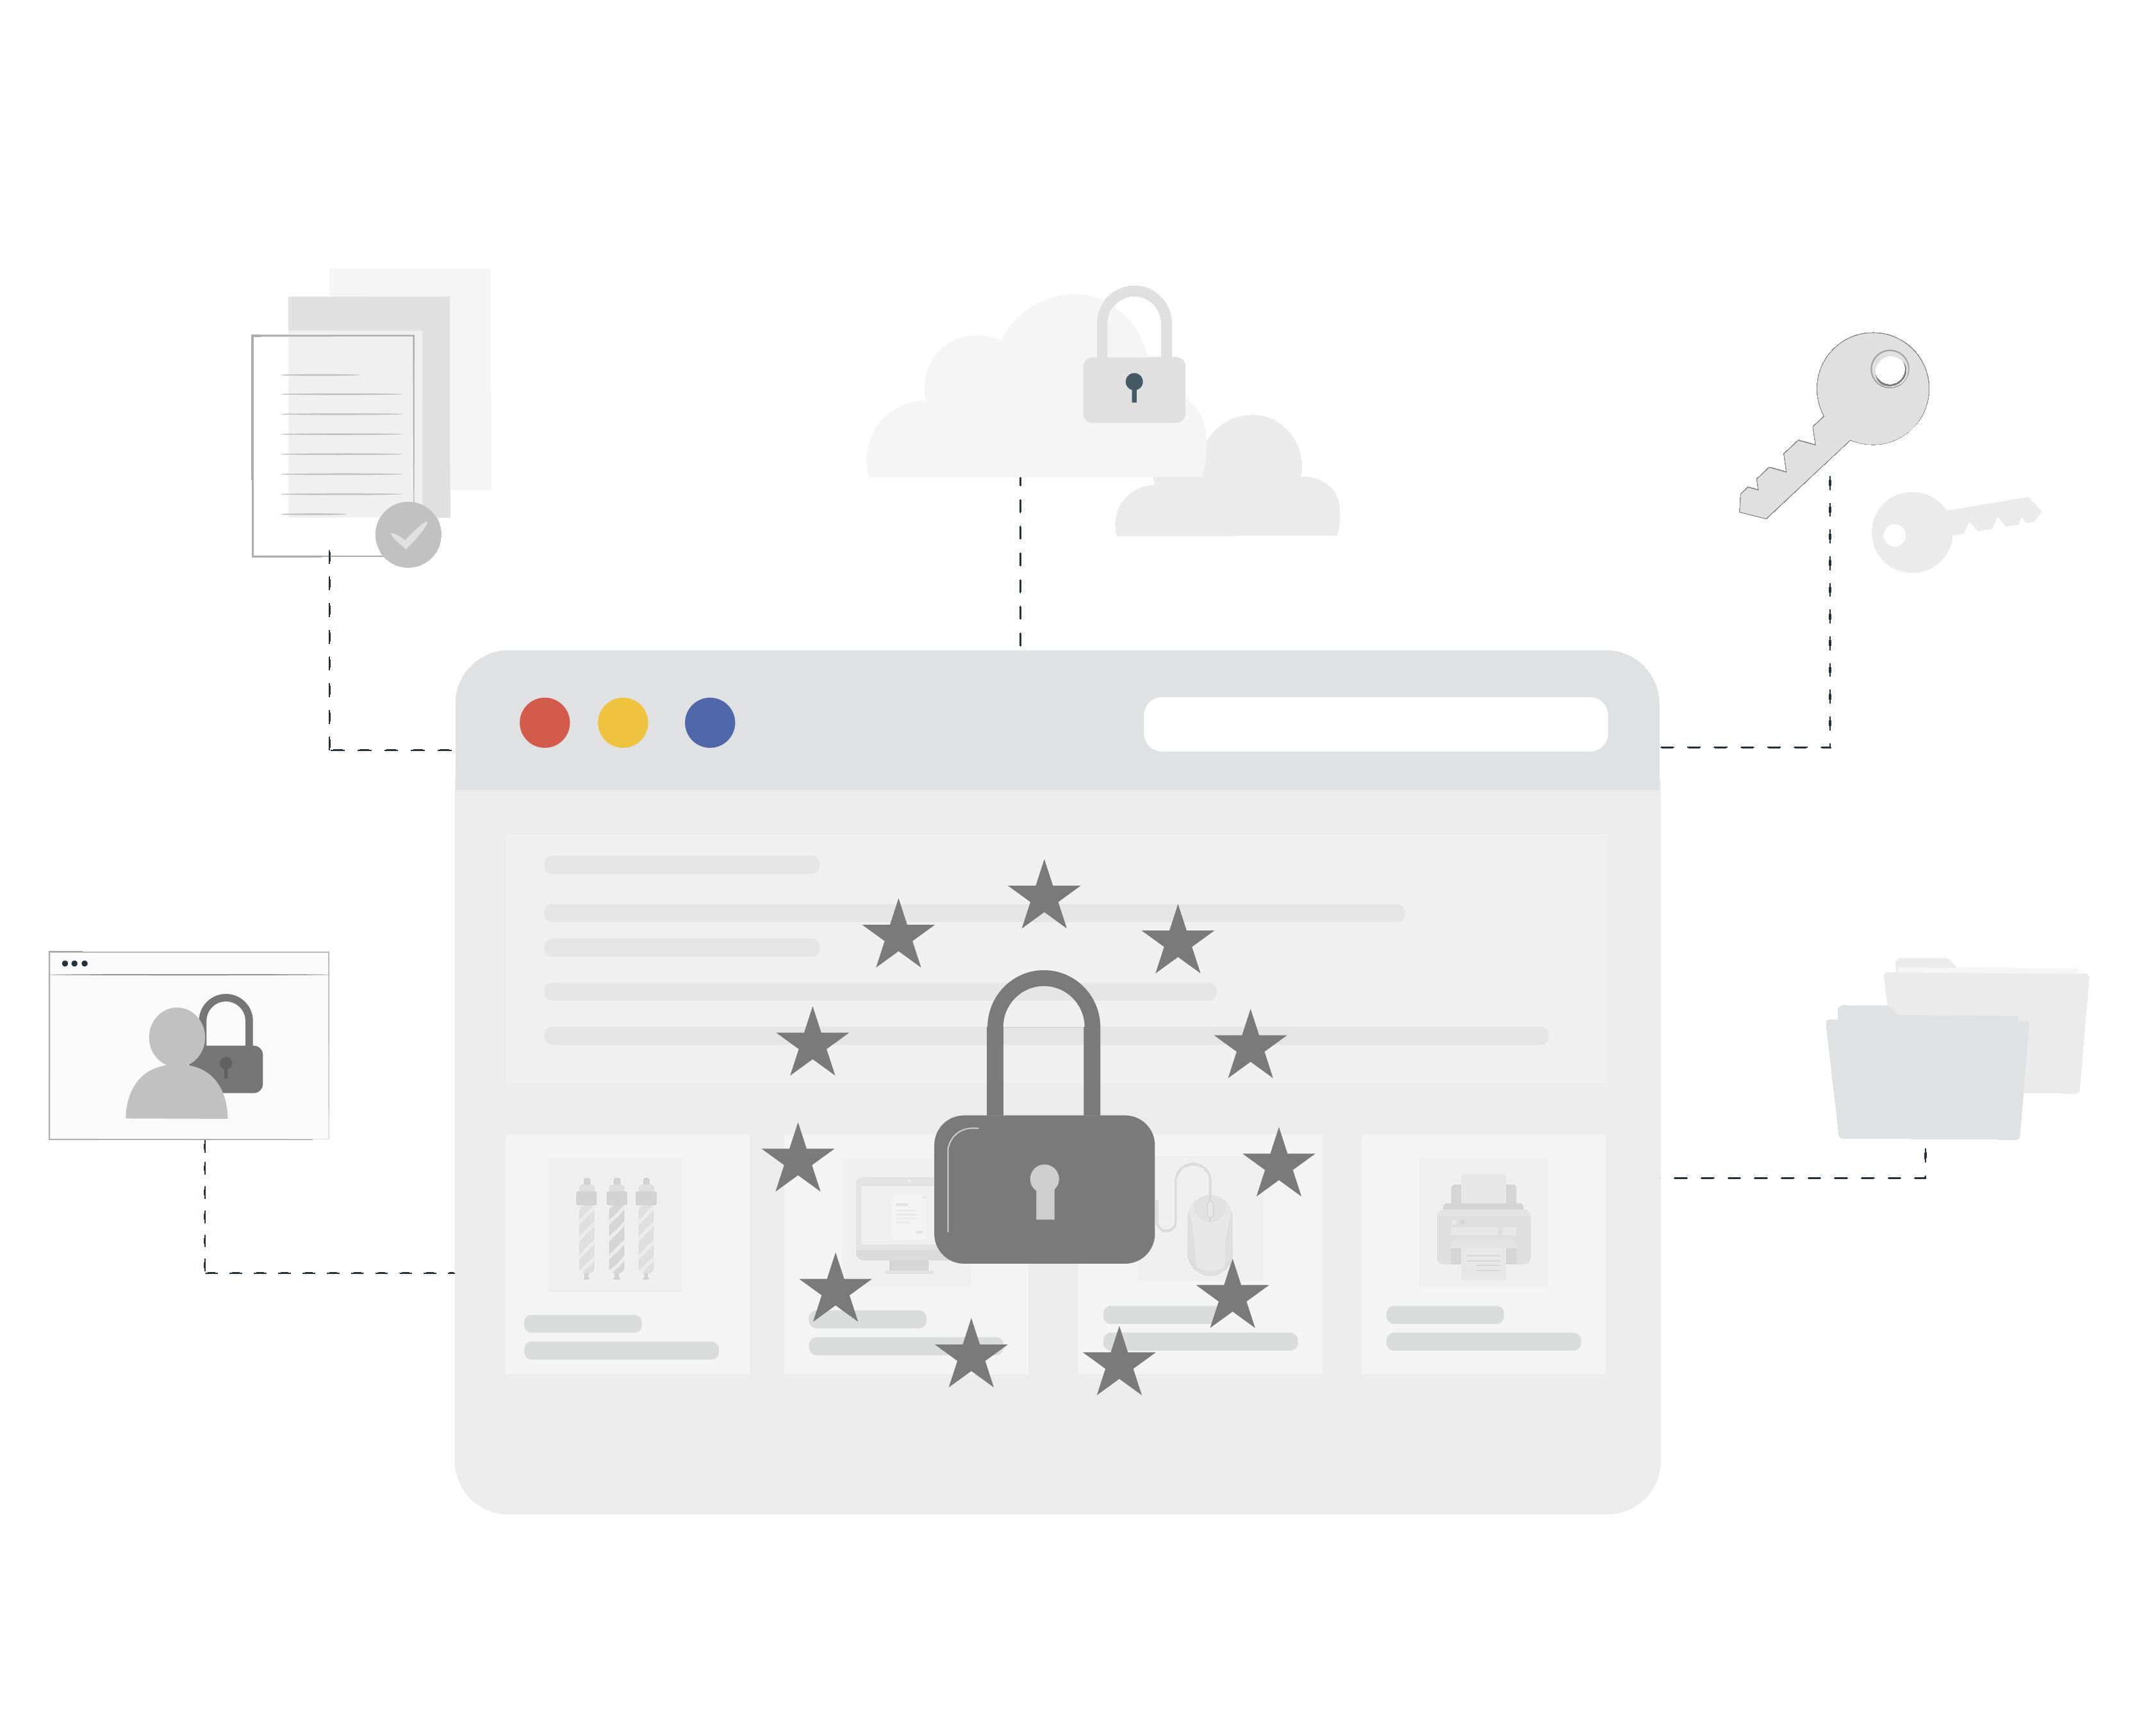 Enhancing the Security for VARStreet Platform using WAF (Web Application Firewall)